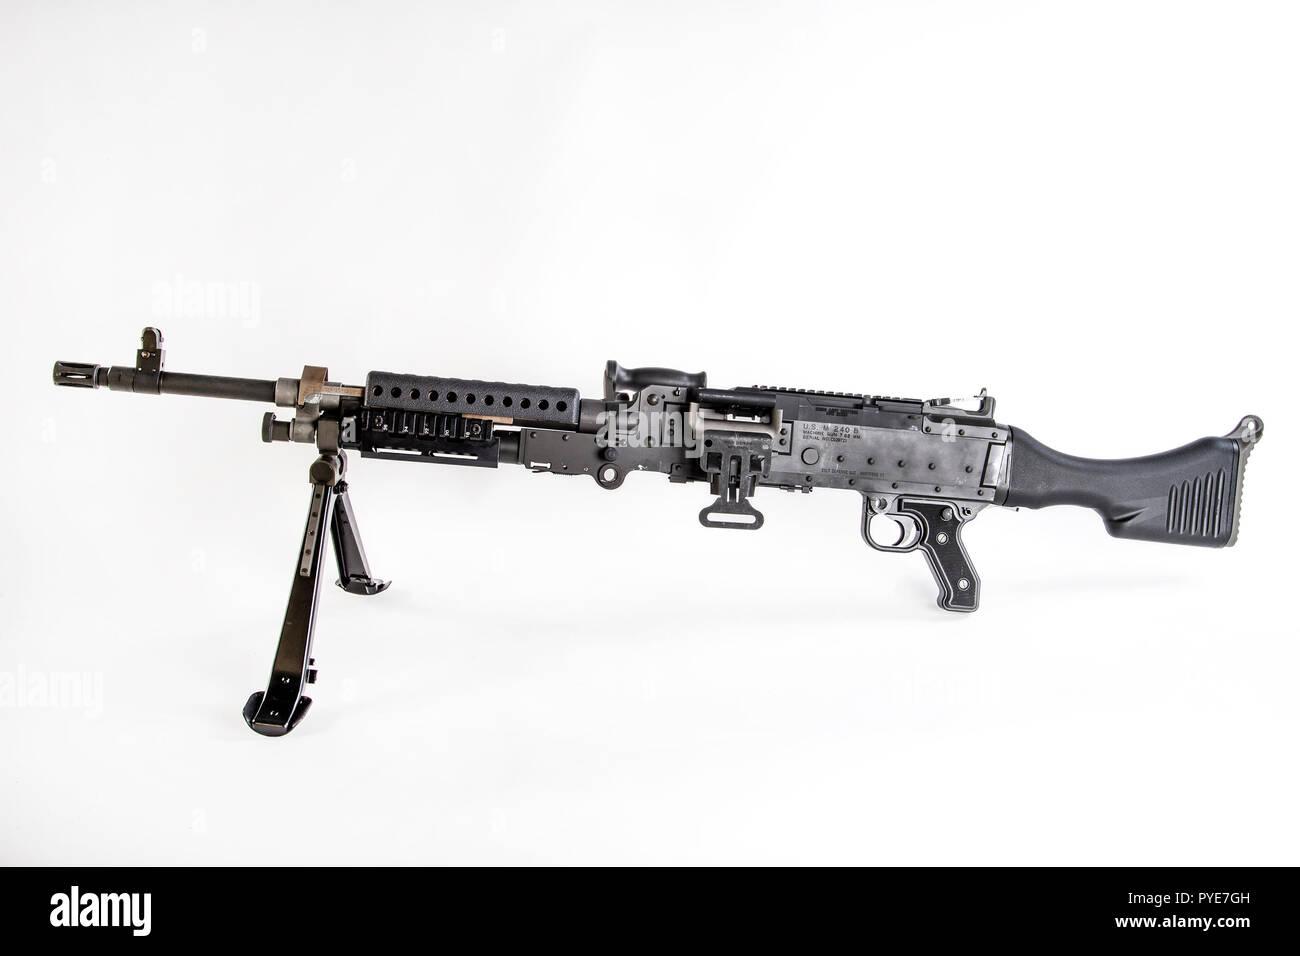 M240 Machine Gun Stock Photos & M240 Machine Gun Stock Images - Alamy